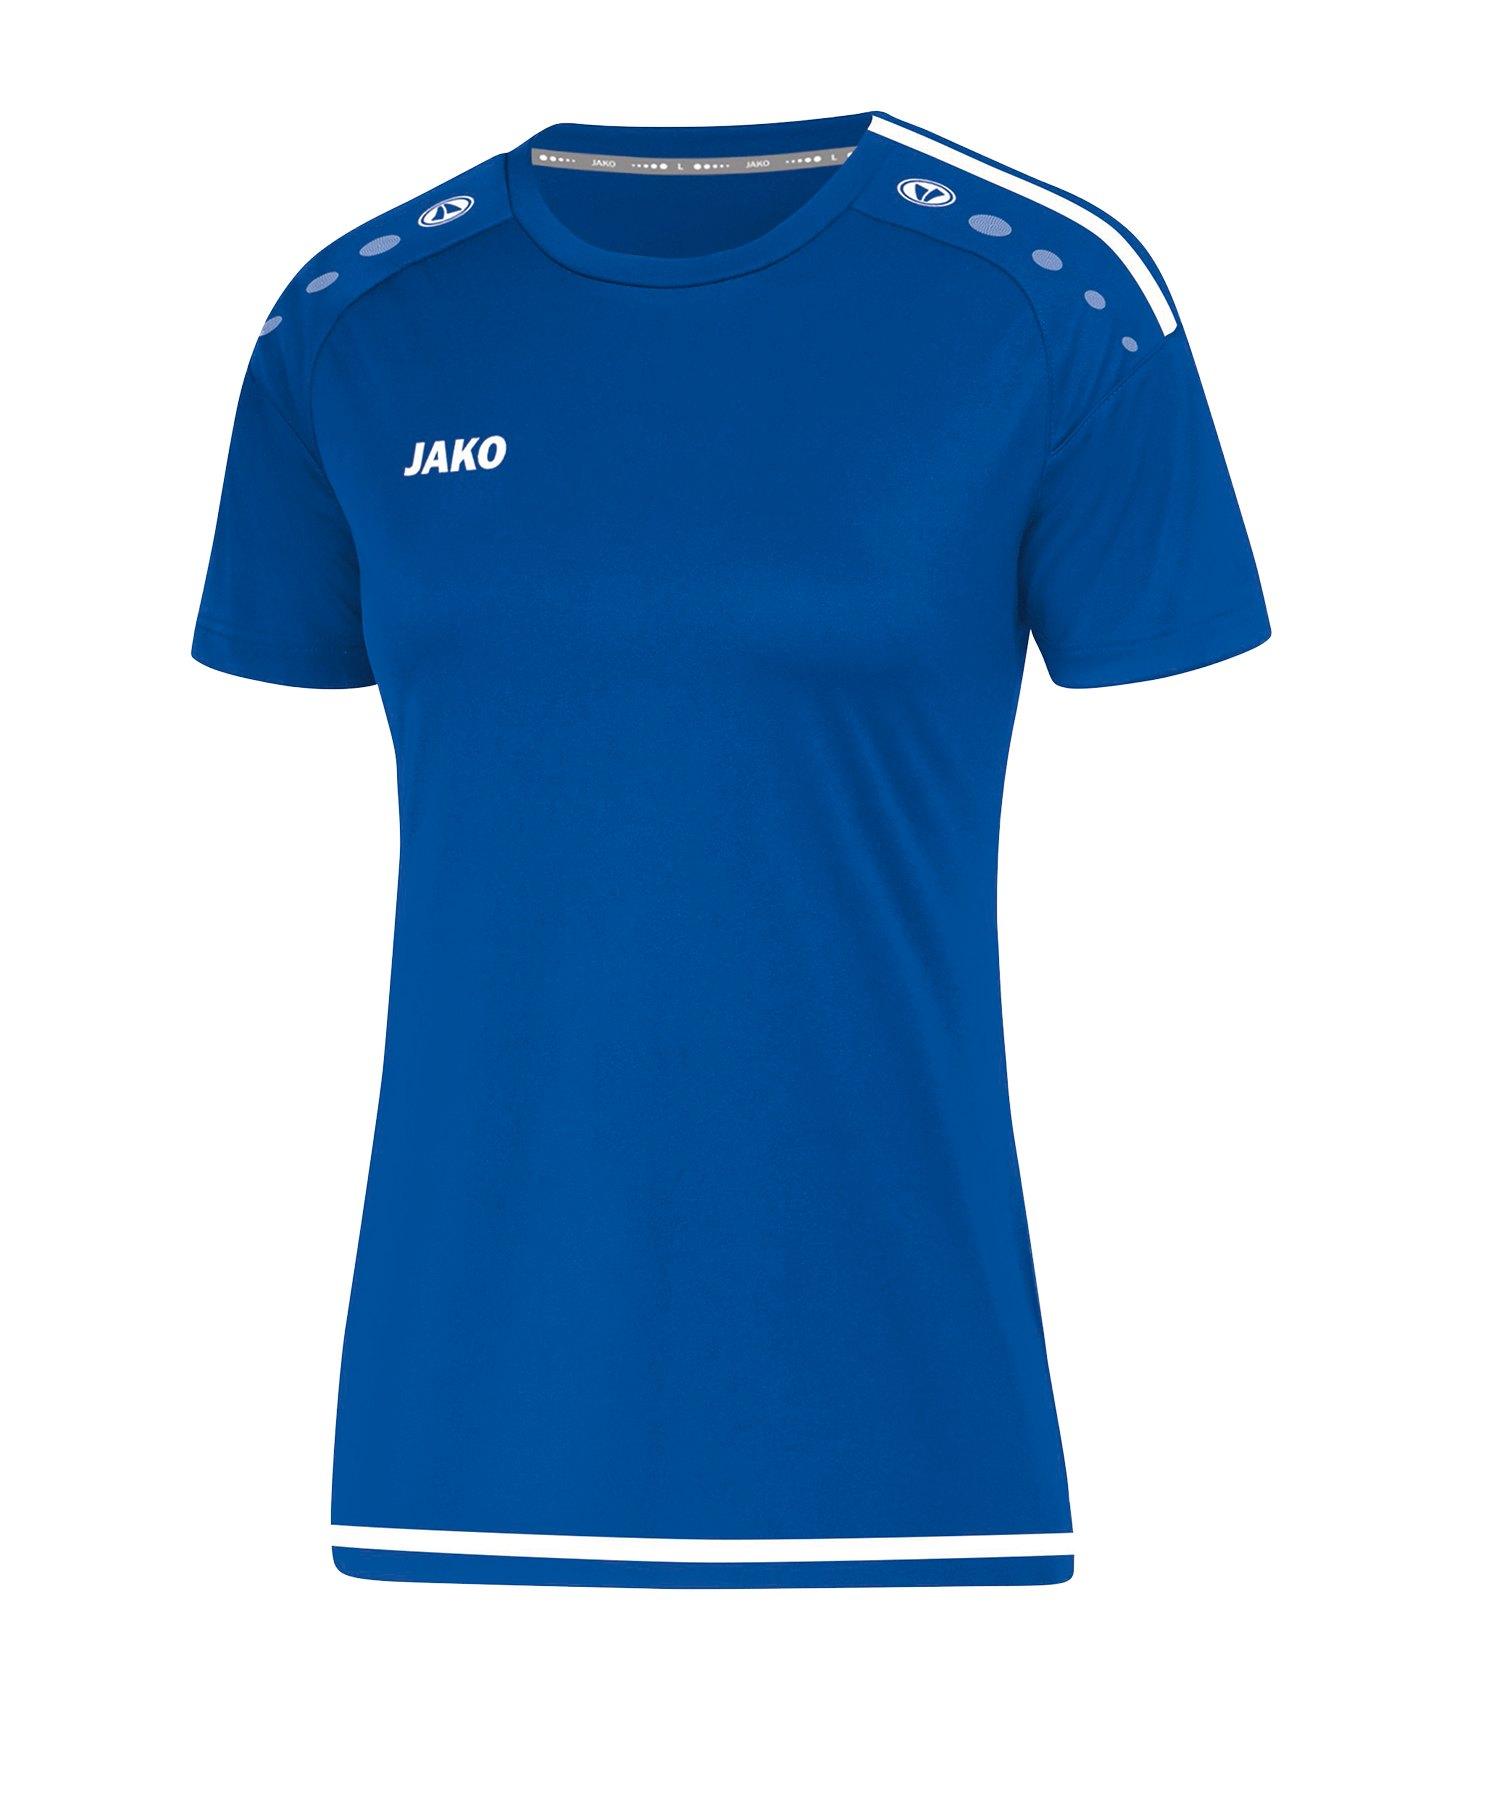 Jako Striker 2.0 Trikot kurzarm Damen Blau F04 - blau